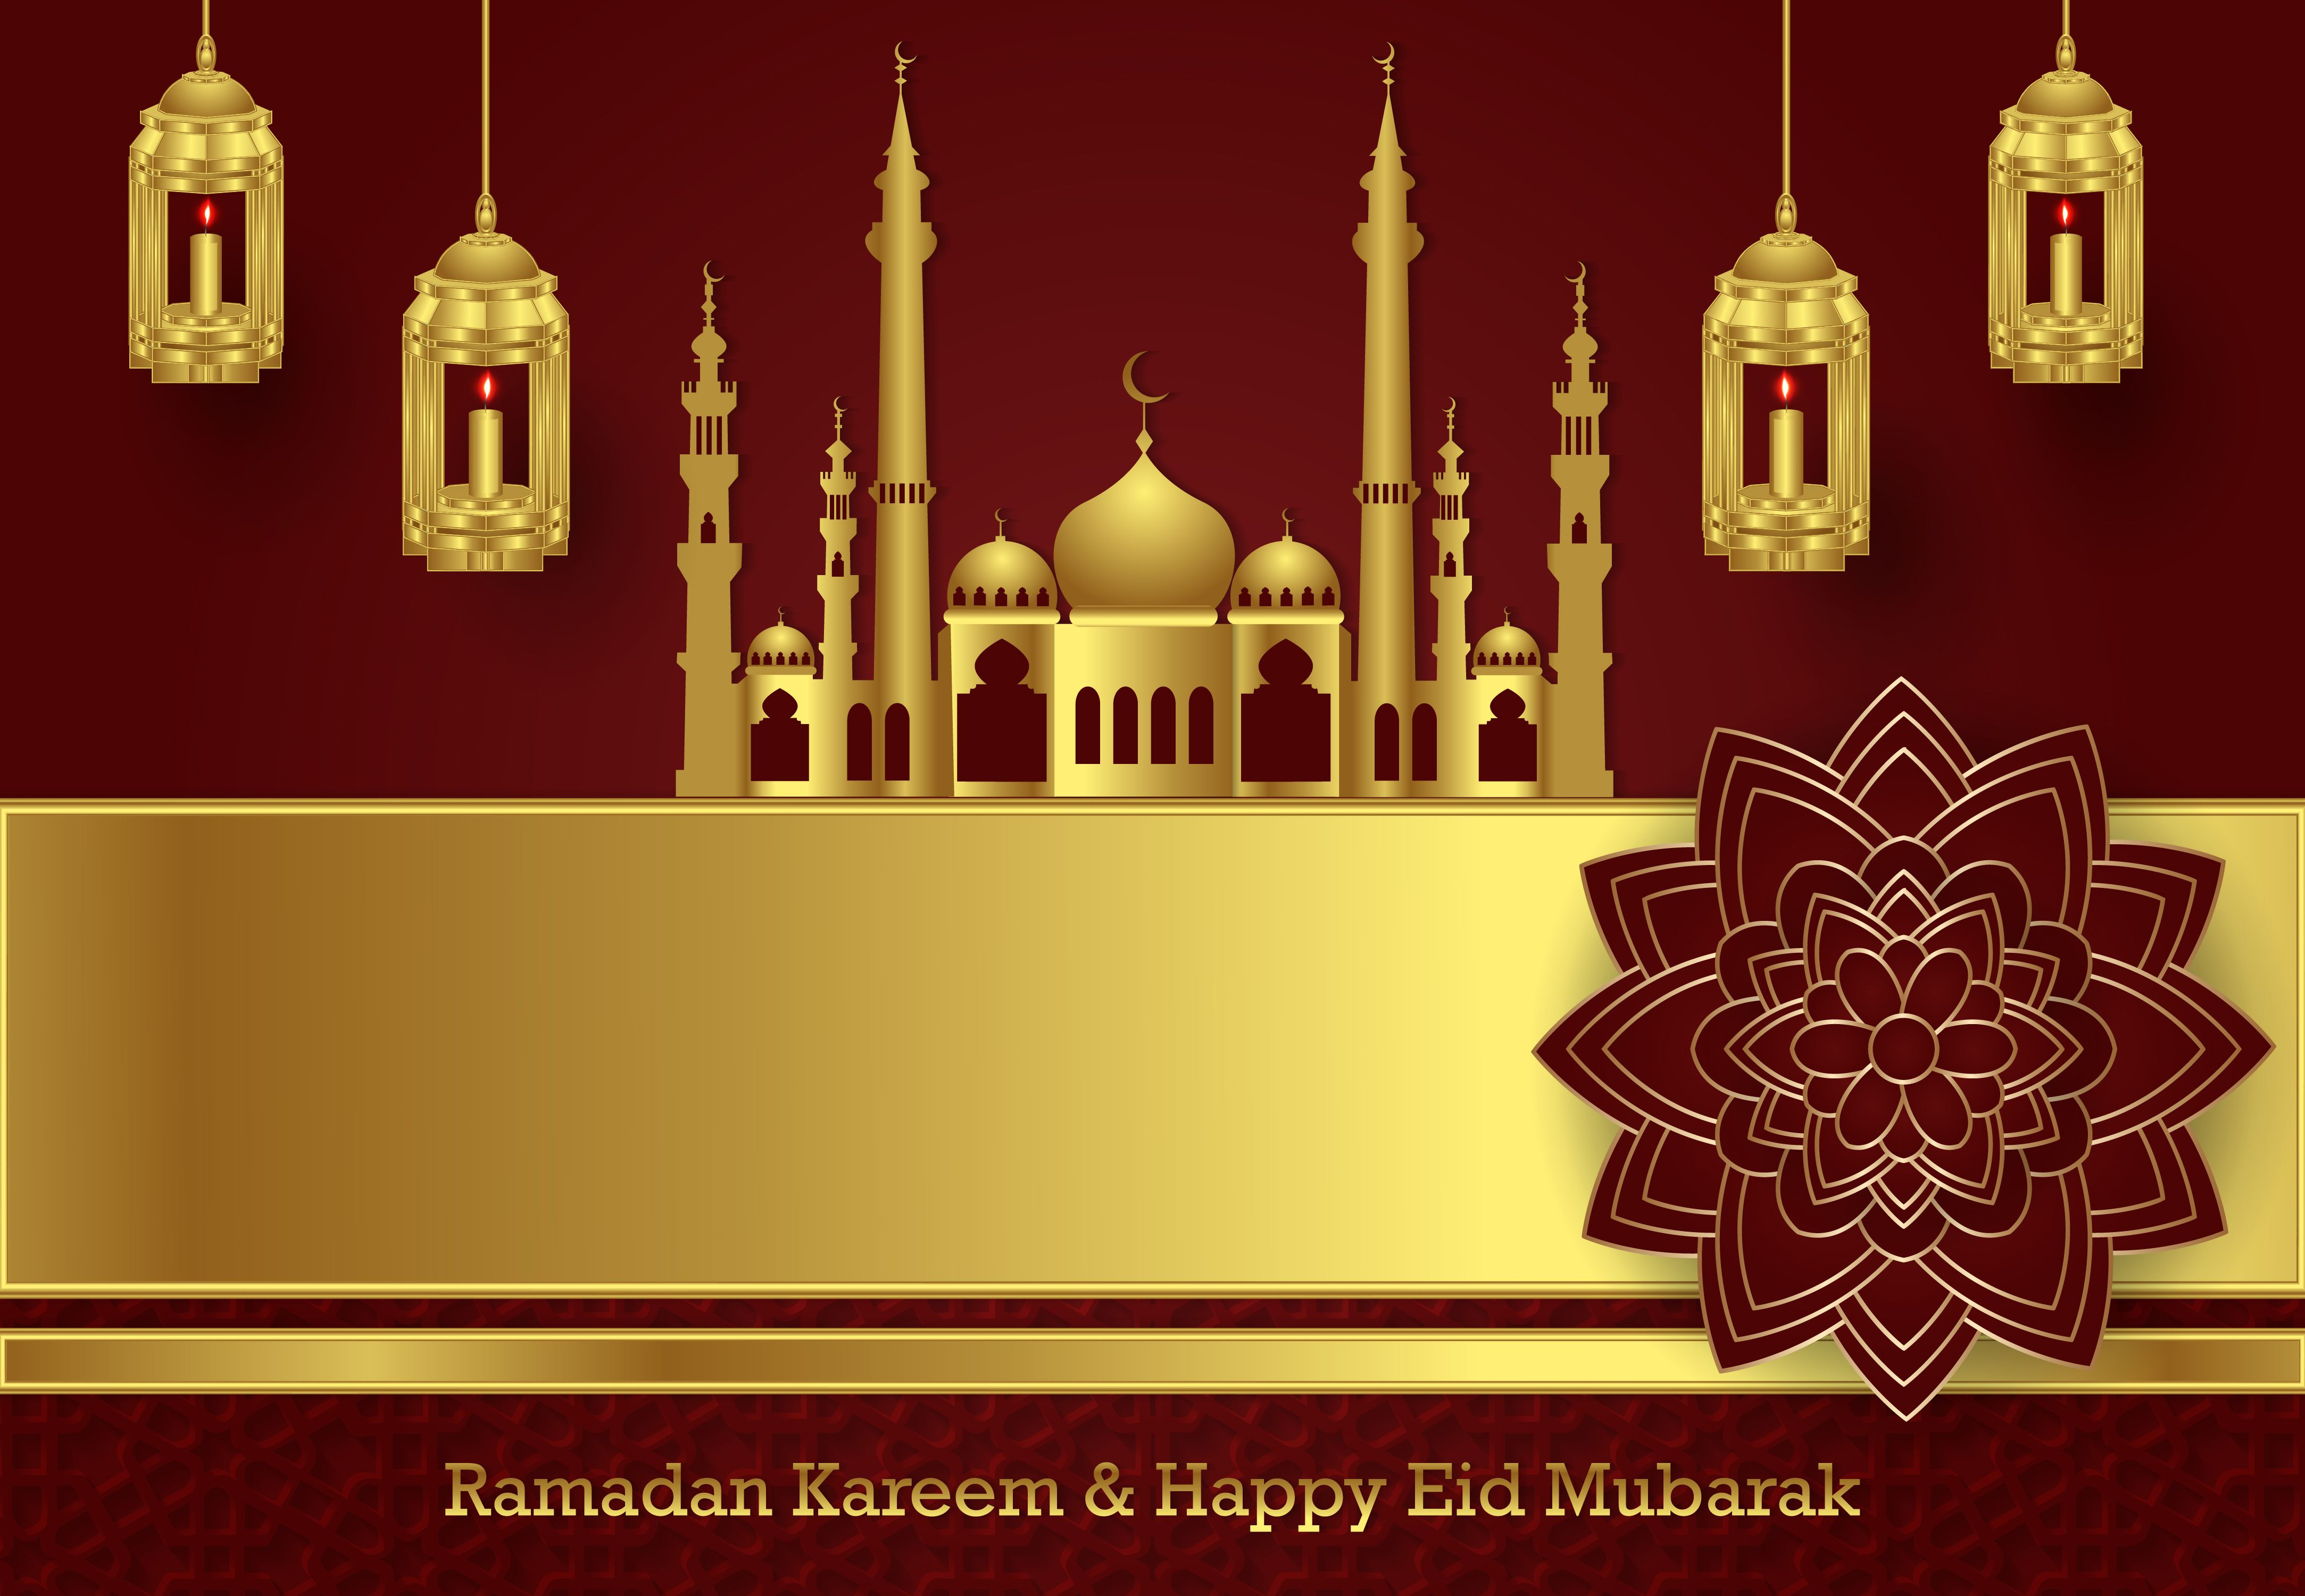 Luxury Ramadan And Happy Eid Mubarak Graphic By Sugarv Creative